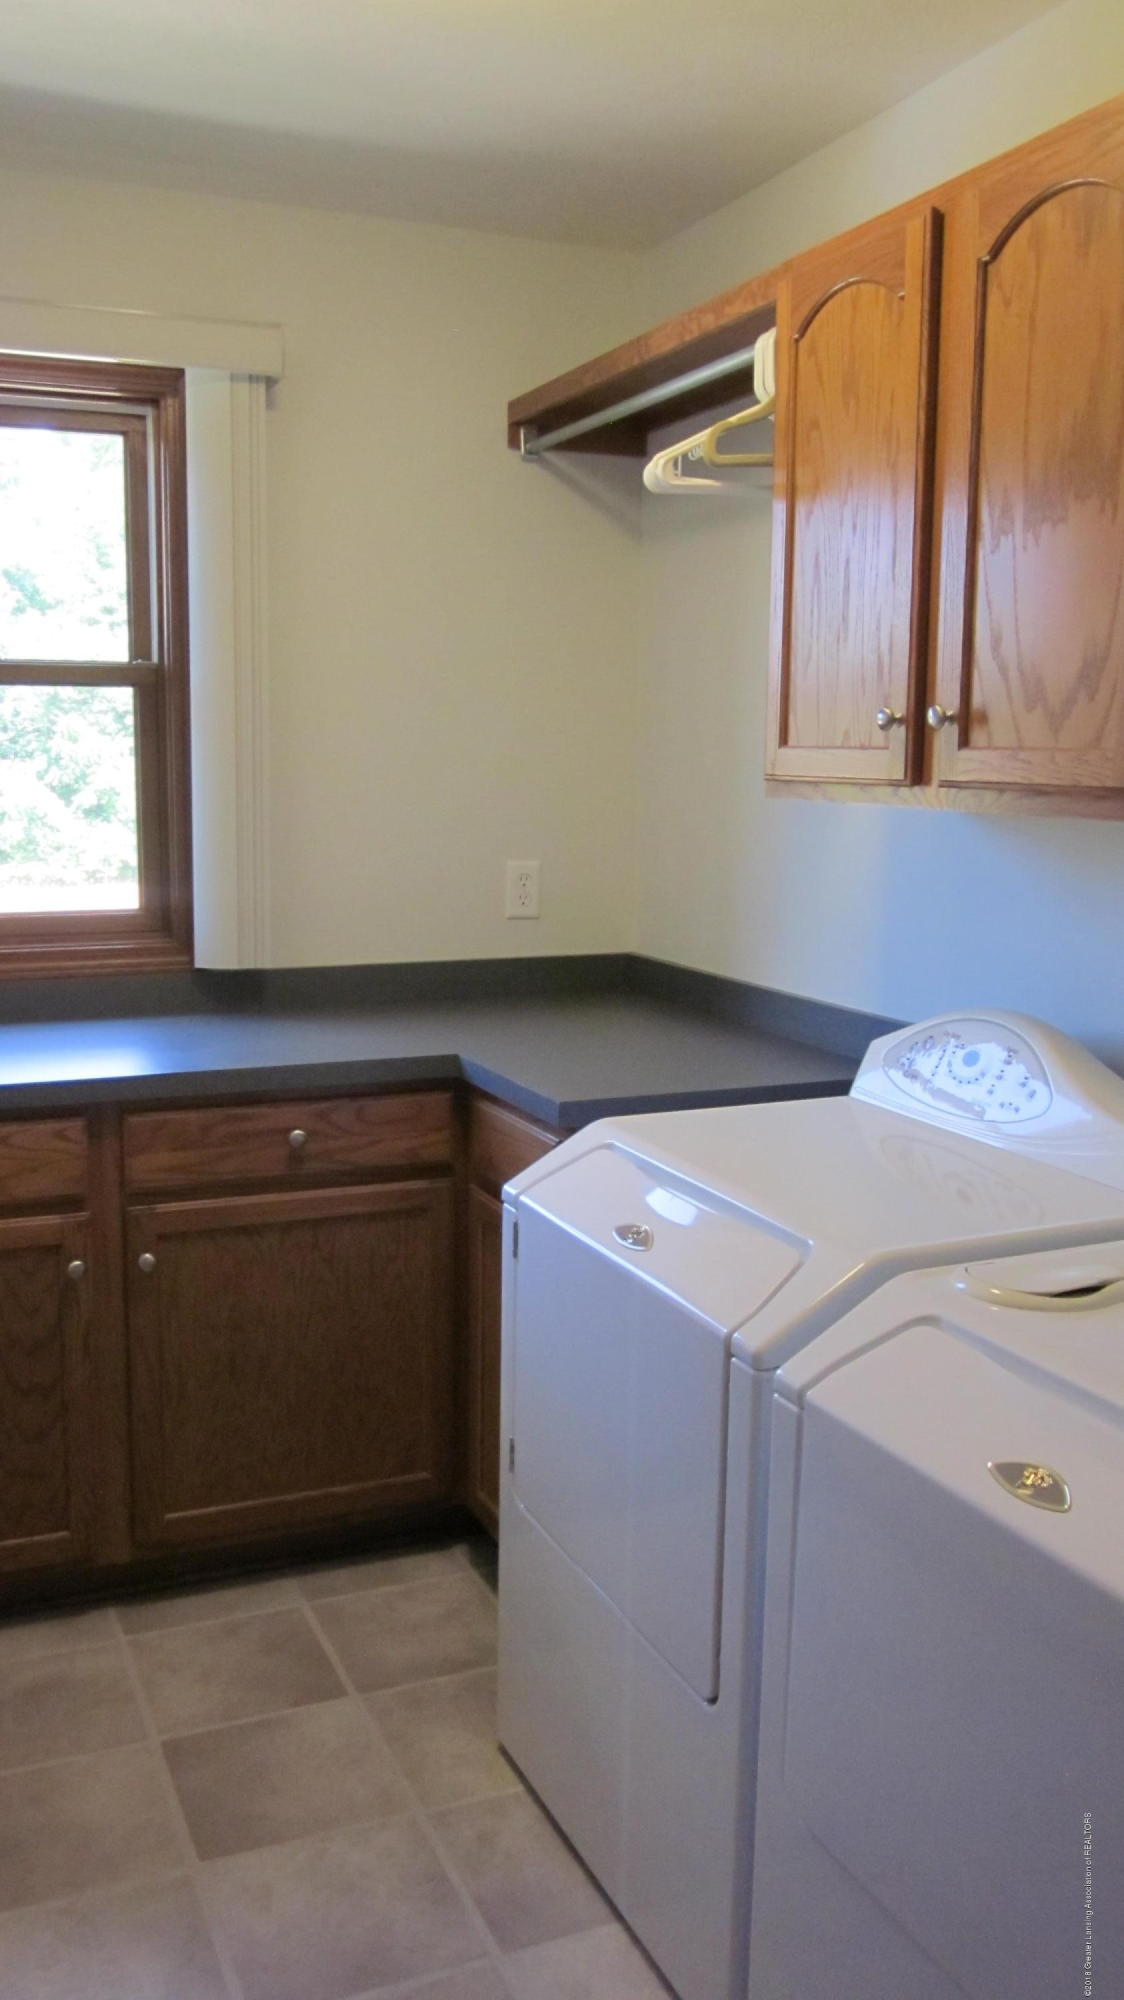 5384 S Stine Rd - Laundry - 11